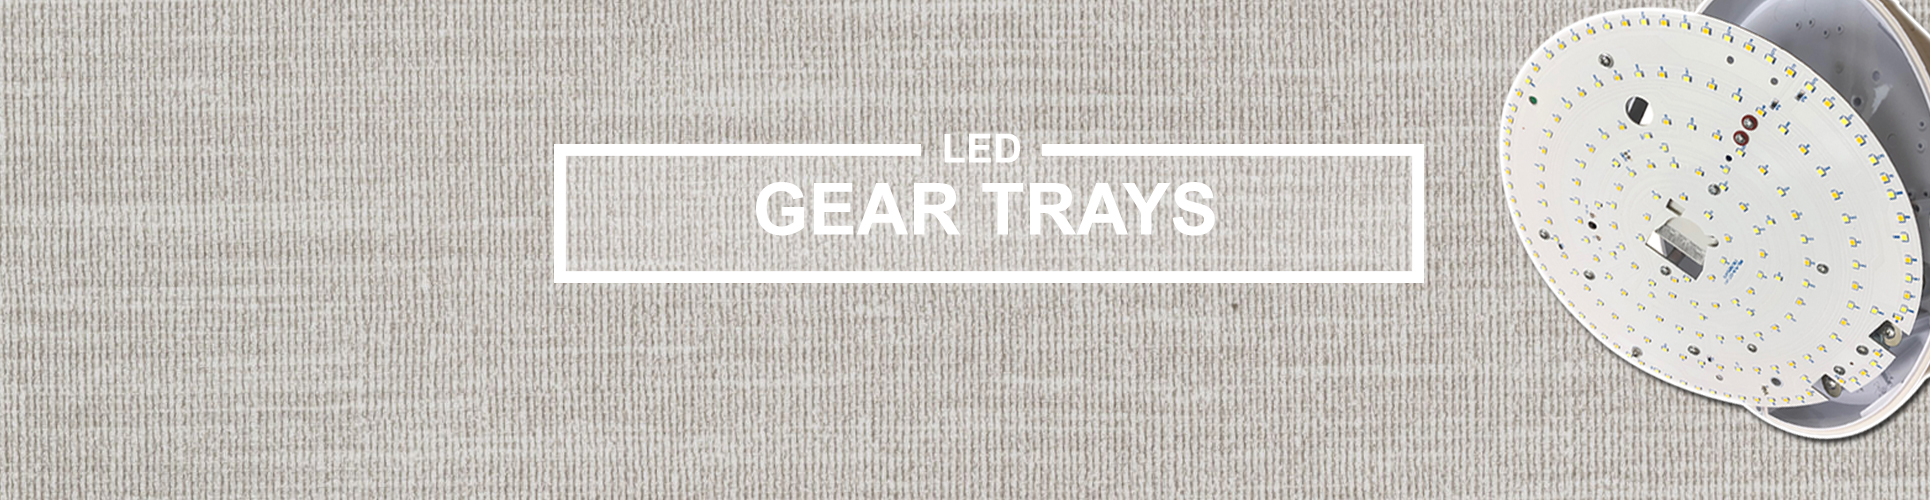 Gear trays